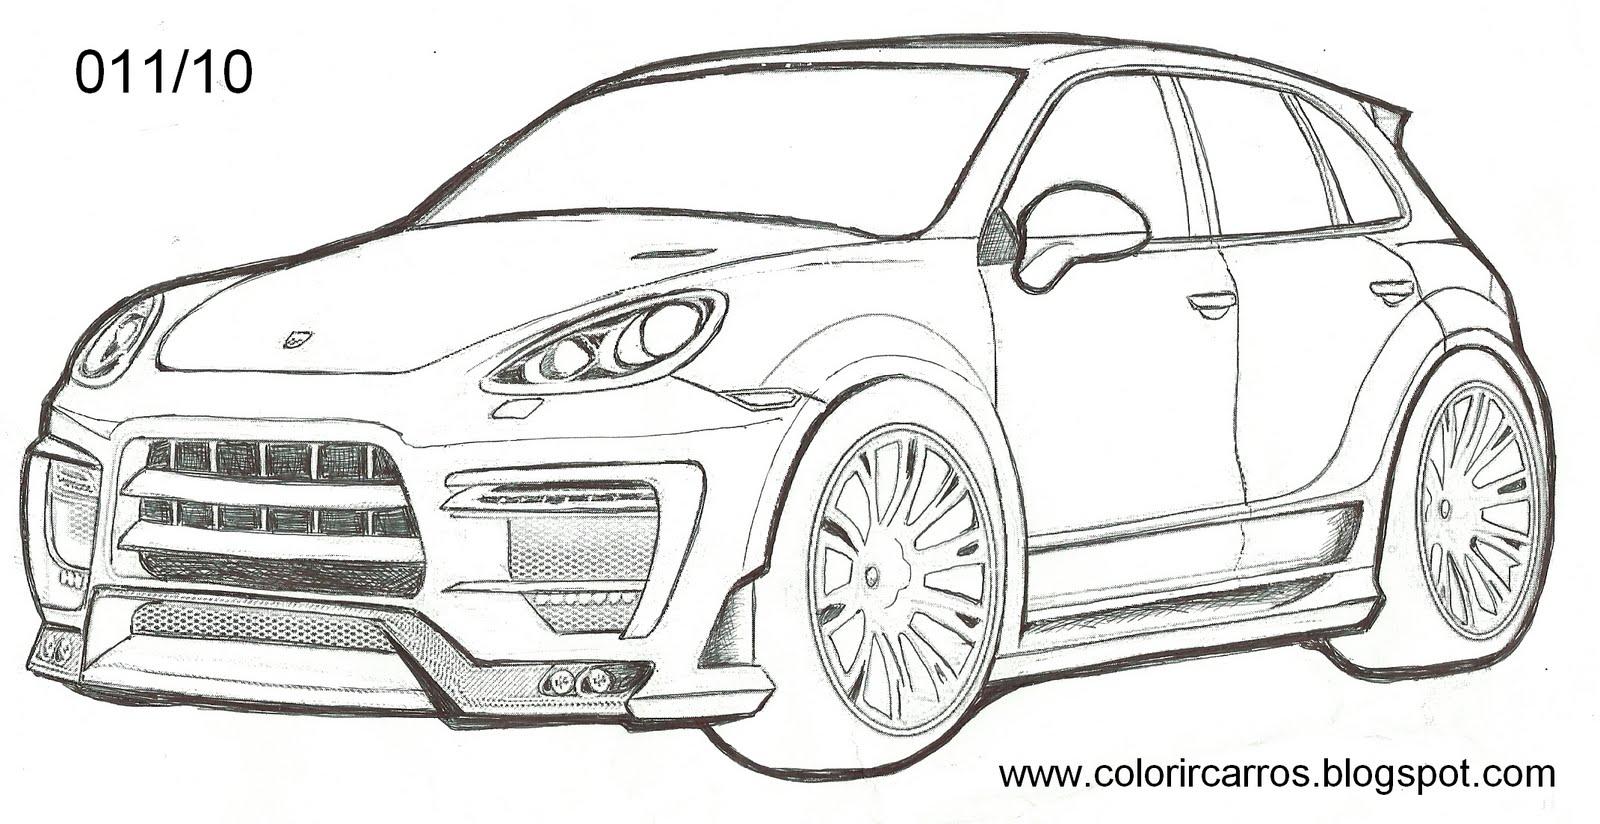 imagens para colorir no paint de carros